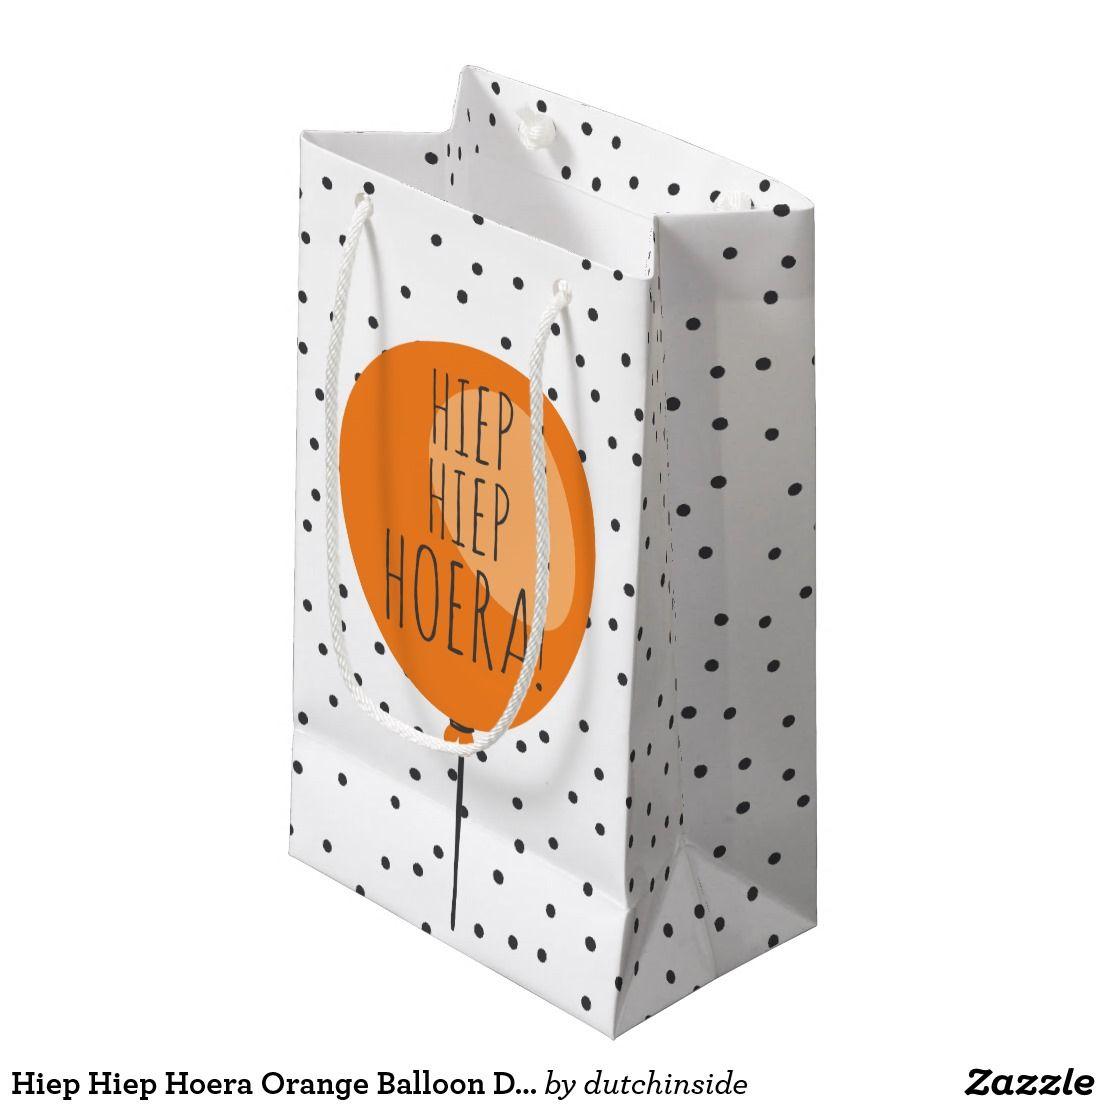 Hiep Hiep Hoera Orange Balloon Dutch Birthday Small Gift